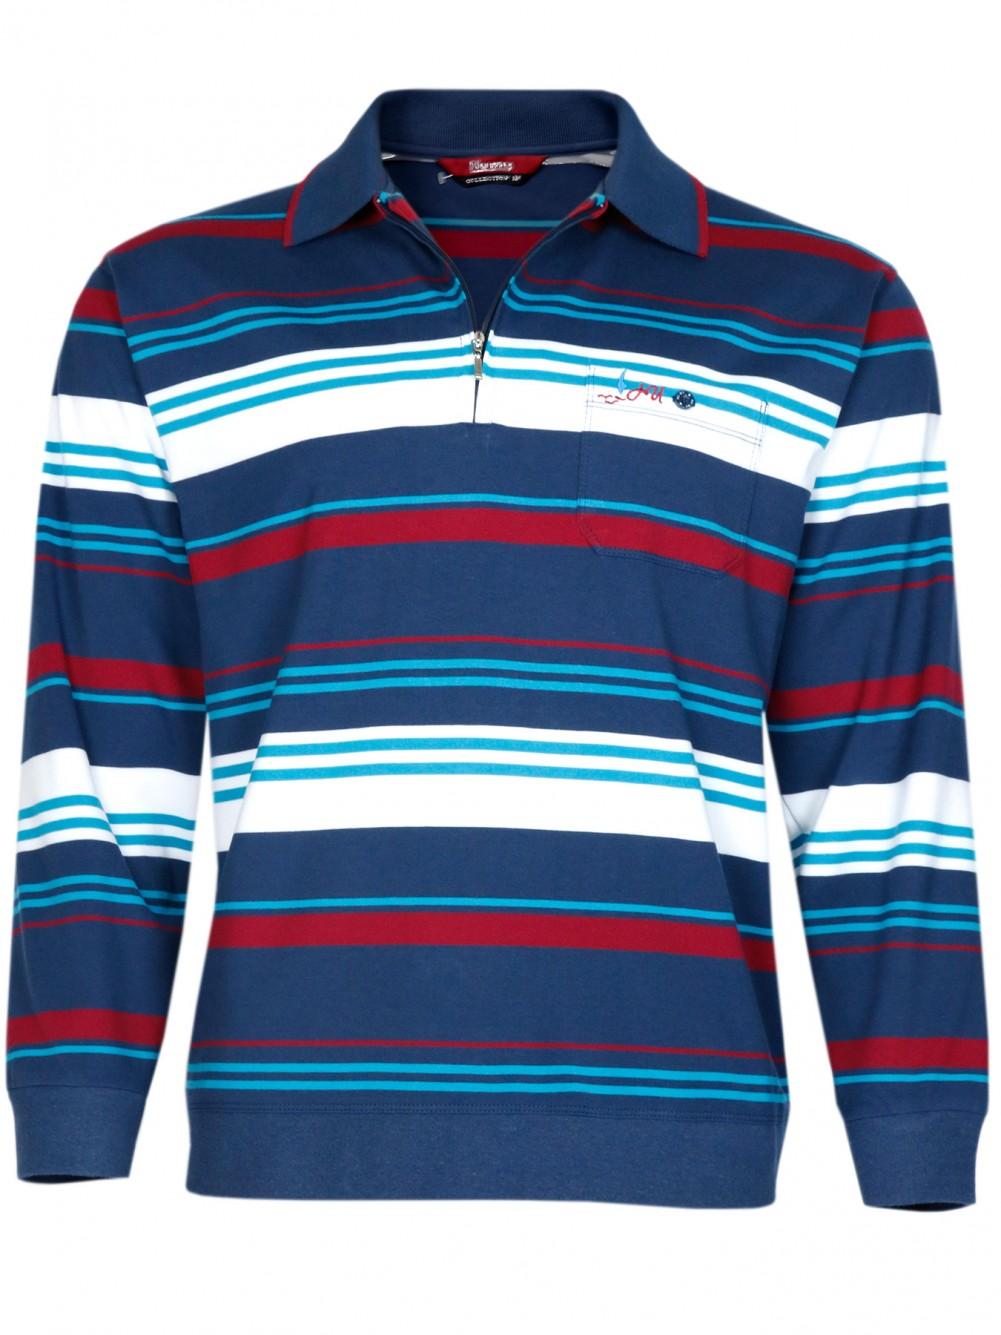 Herren Langarm-Poloshirts aus 100% Baumwolle - dunkelblau